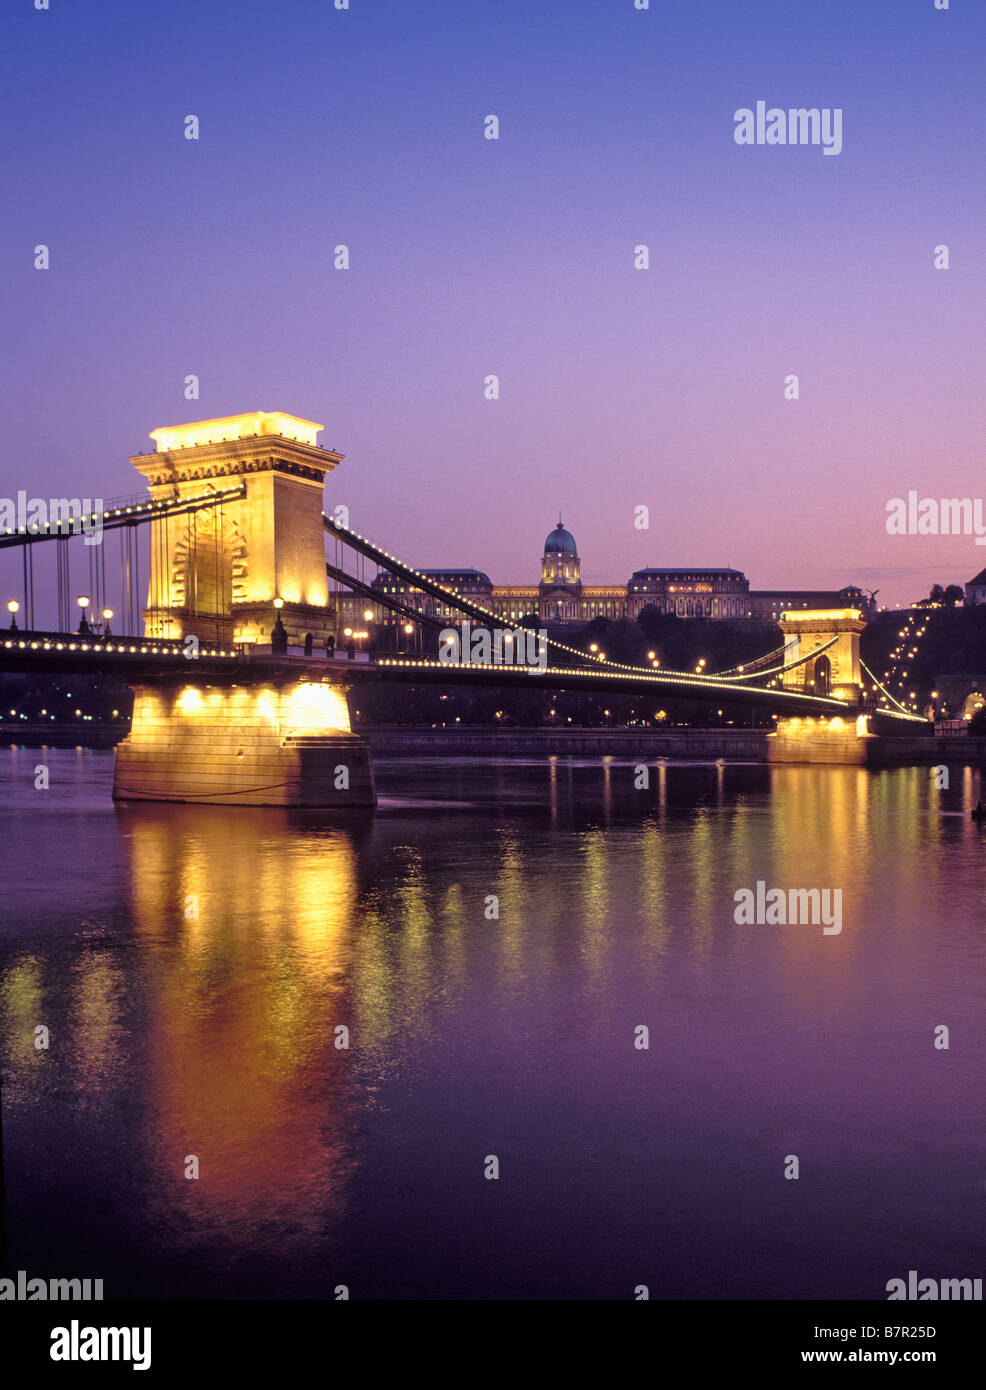 HUNGARY BUDAPEST CHAIN BRIDGE AND ROYAL CASTLE - Stock Image